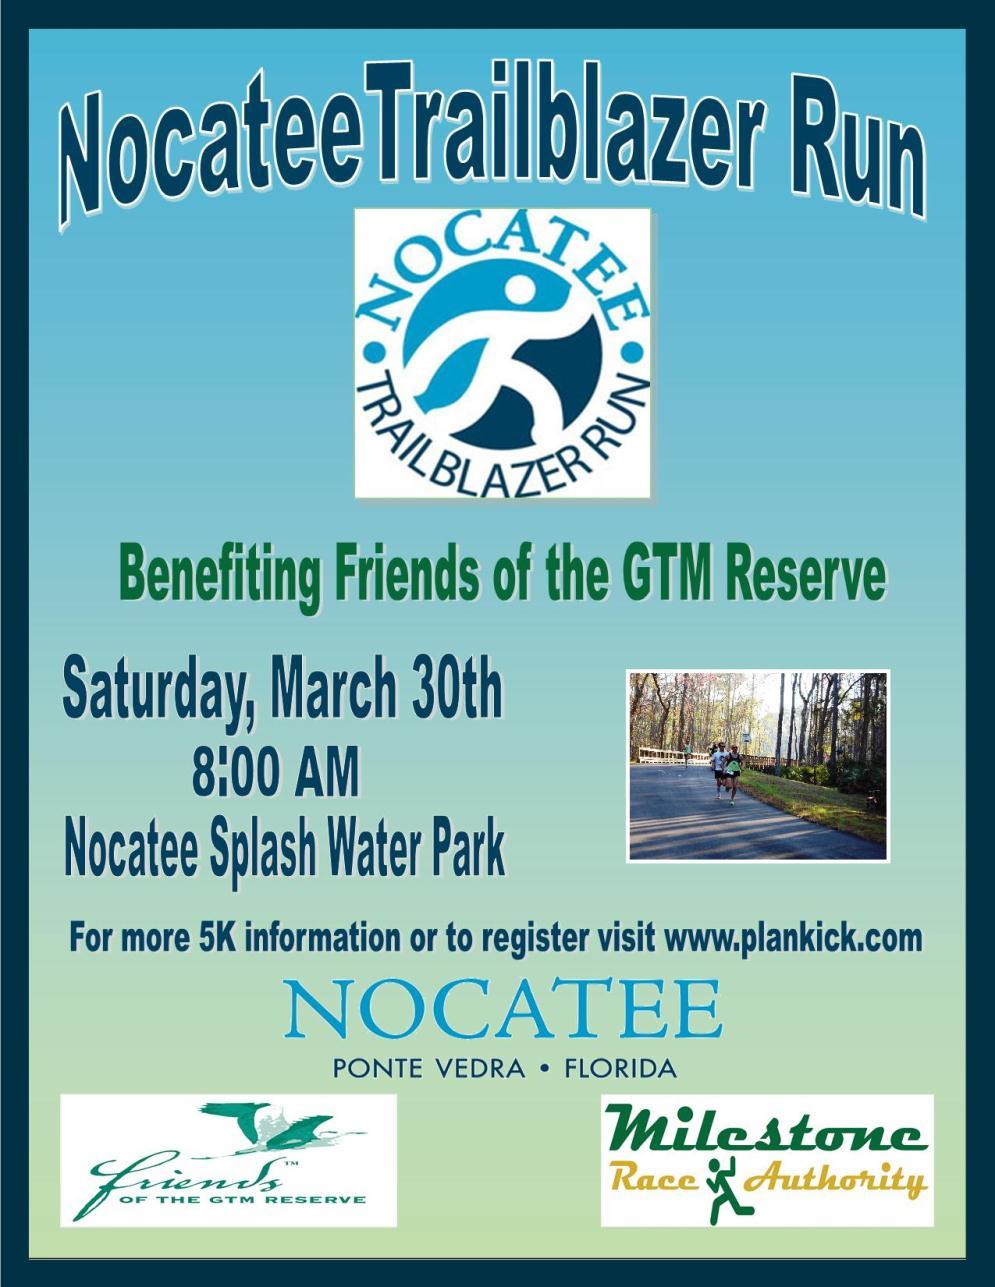 Nocatee events Trailblazer